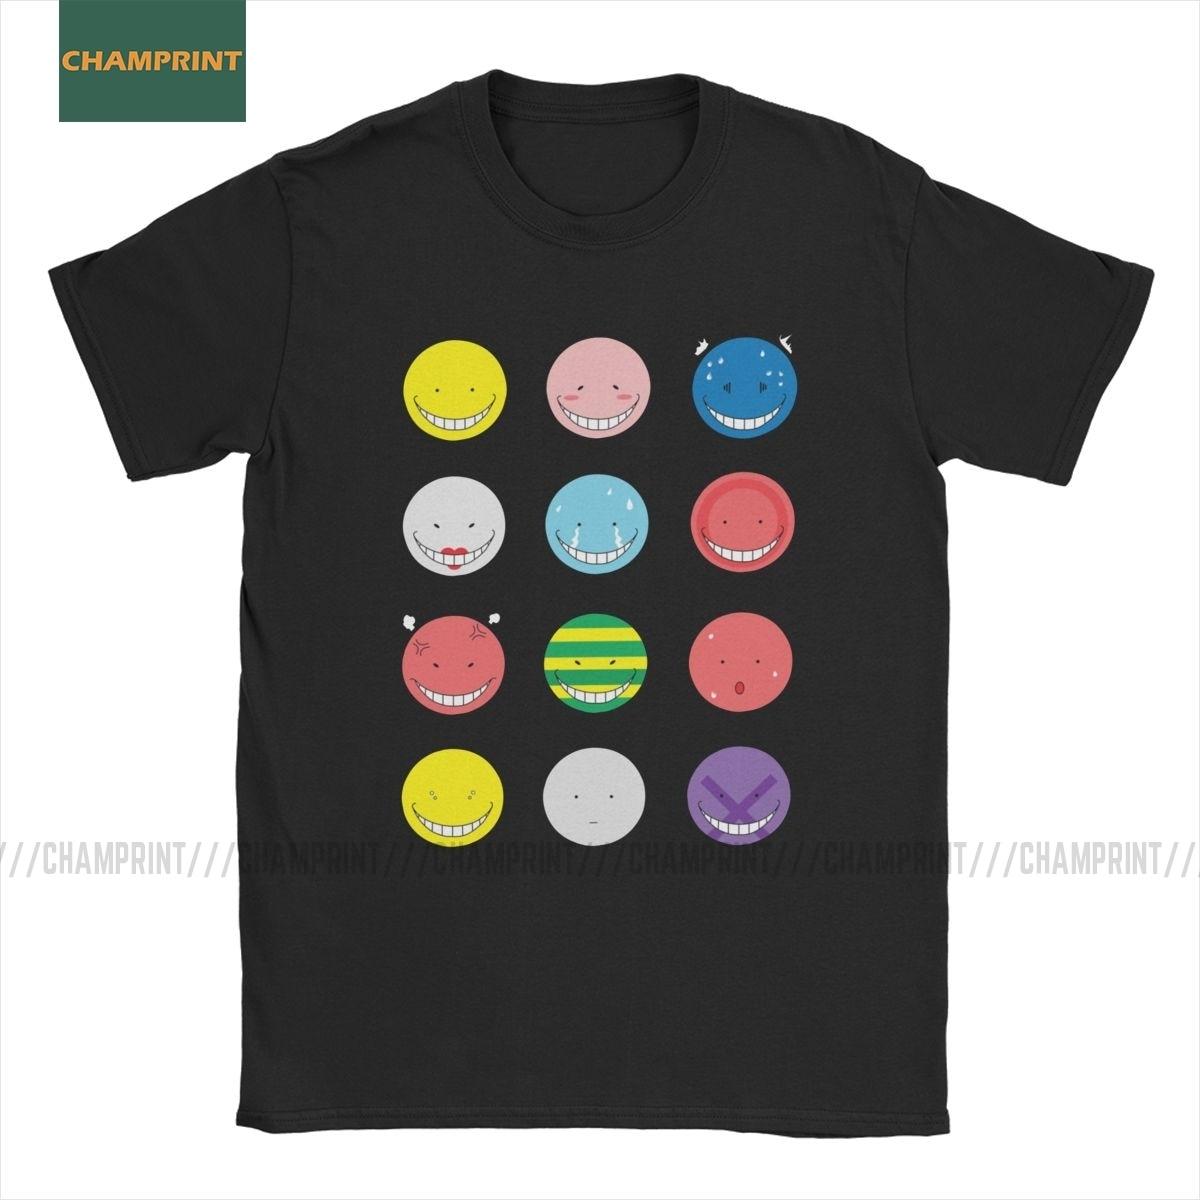 Koro Sensei Emotionen Ermordung Klassenzimmer T-Shirt Männer Baumwolle T Shirt Korosensei Kyoushitsu Shiota Klasse 3-E Kurzarm T